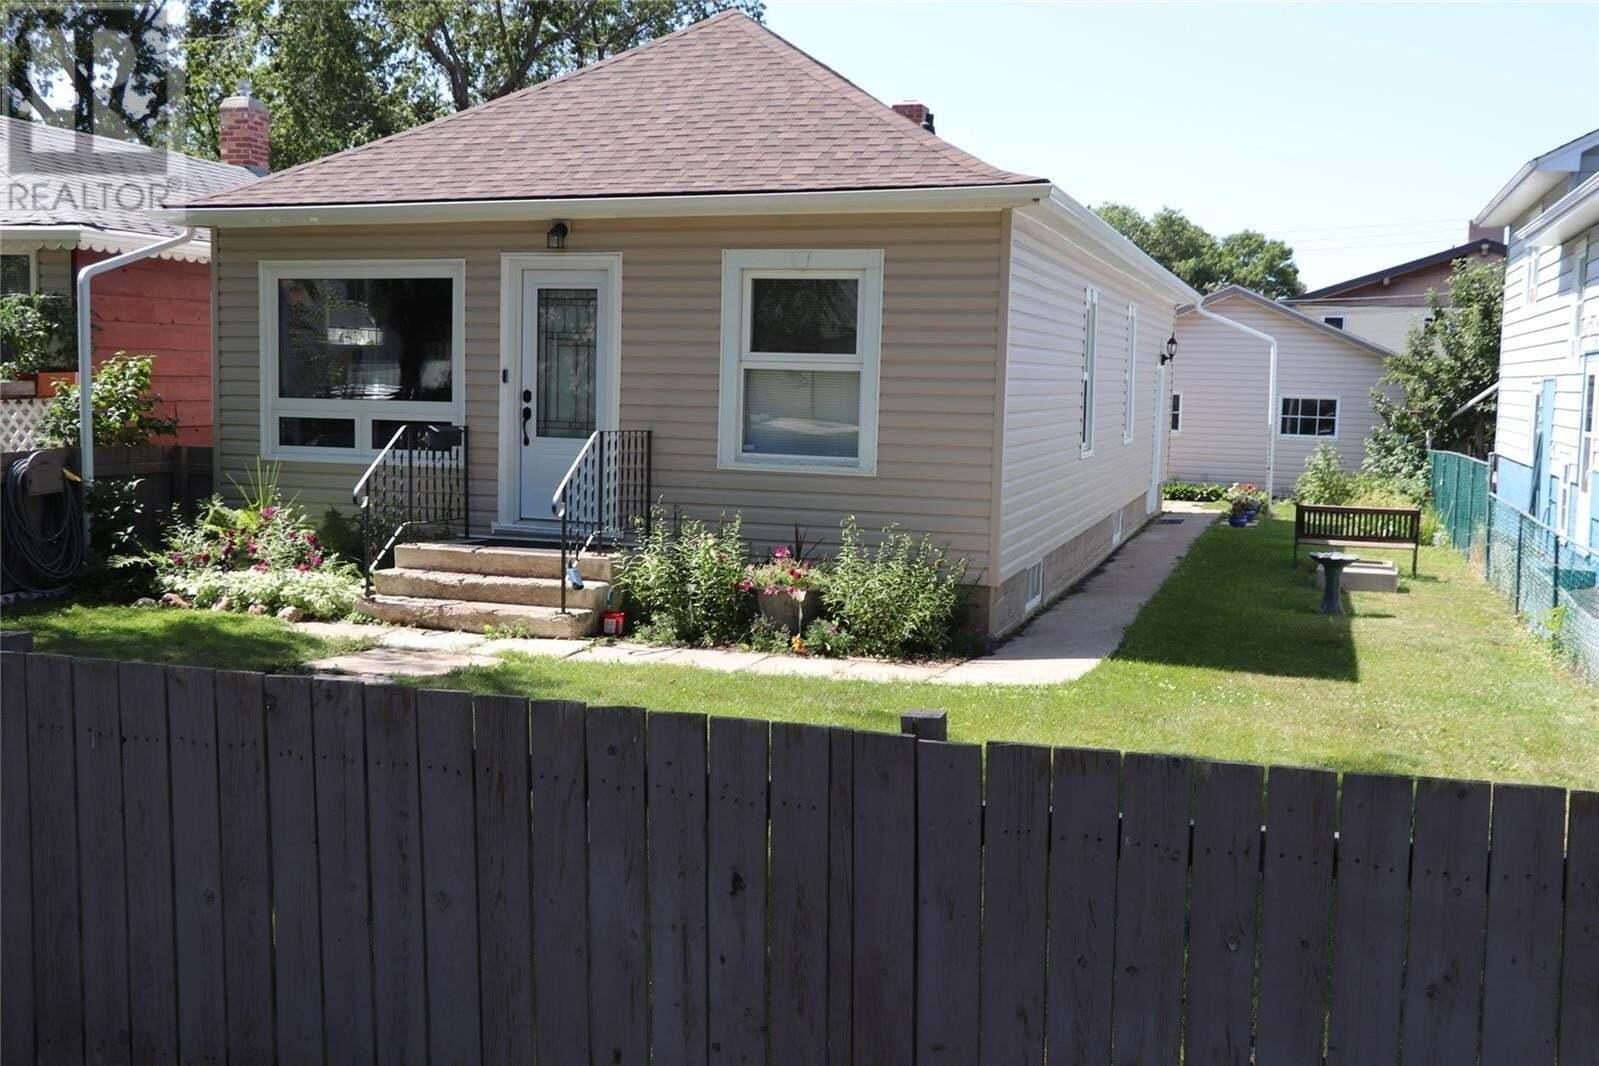 House for sale at 1131 H Ave N Saskatoon Saskatchewan - MLS: SK819125